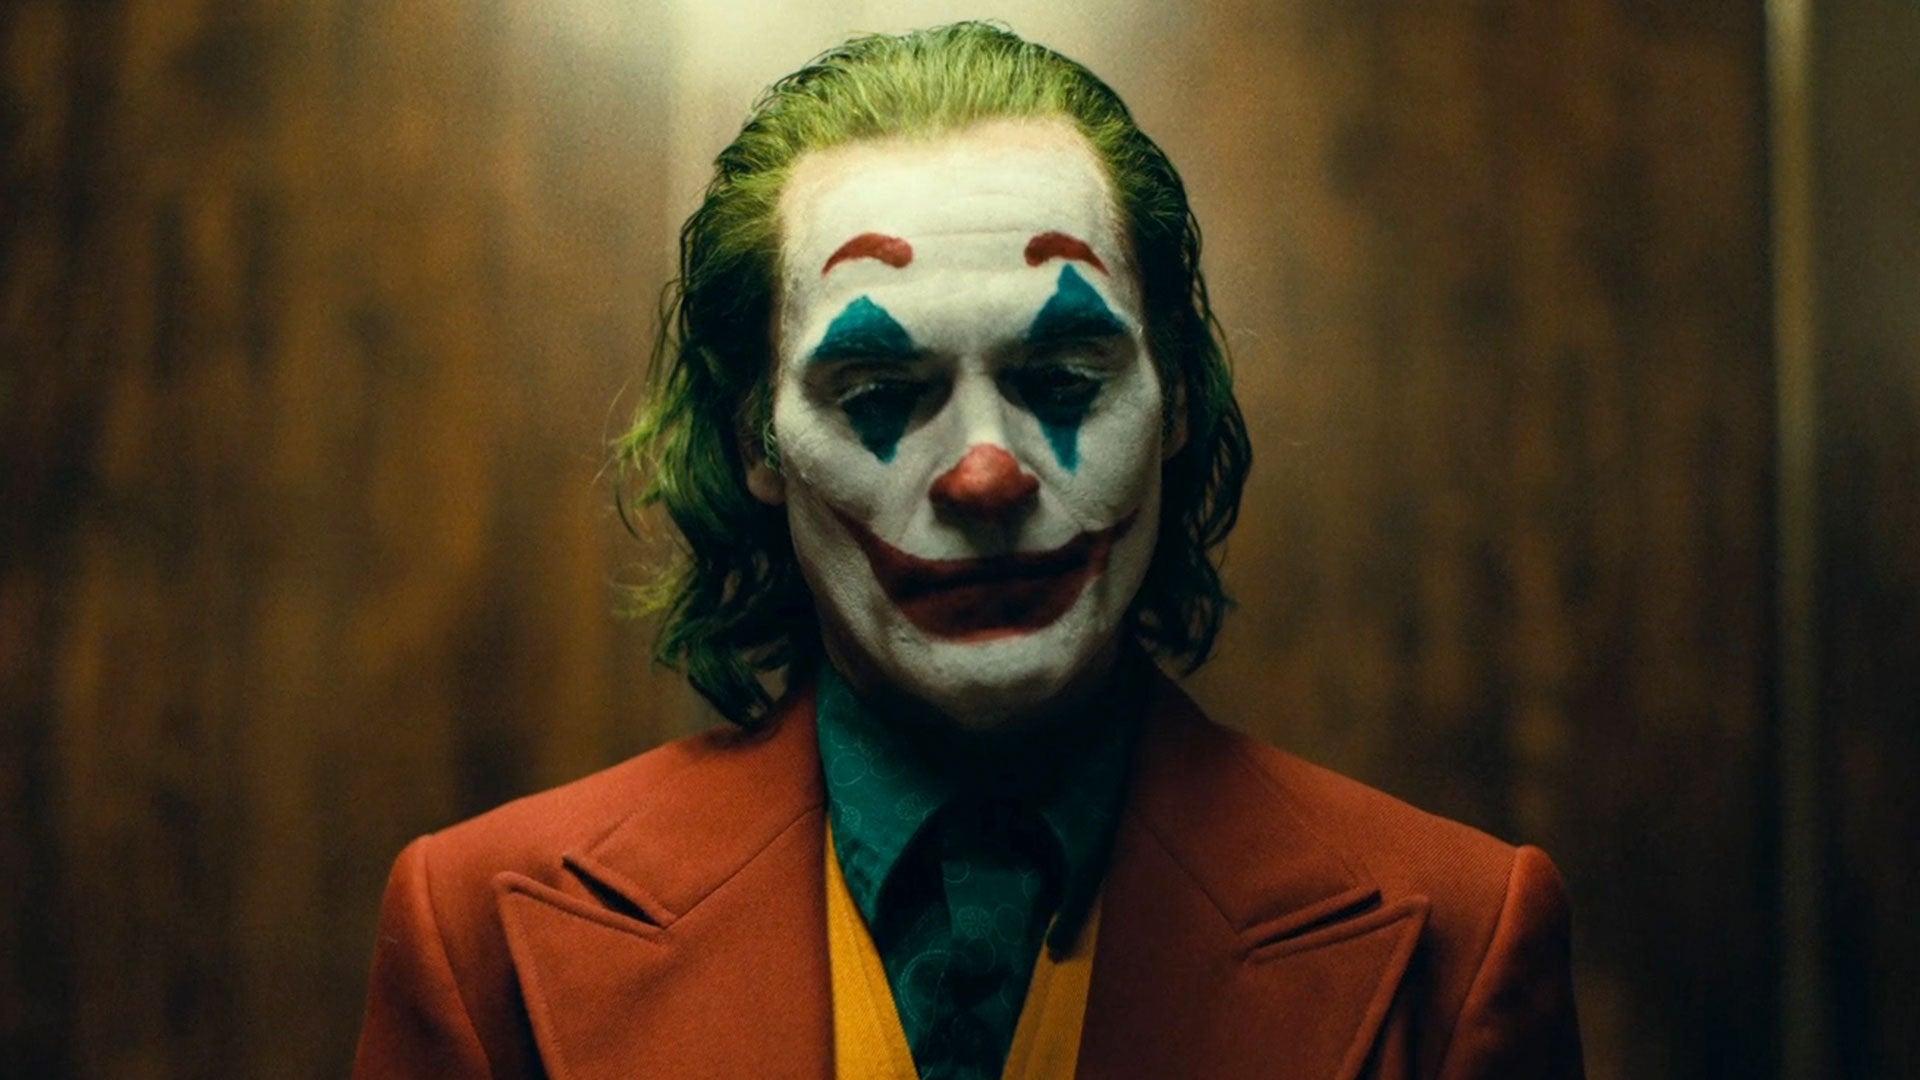 Movie Review: Joker (2019)